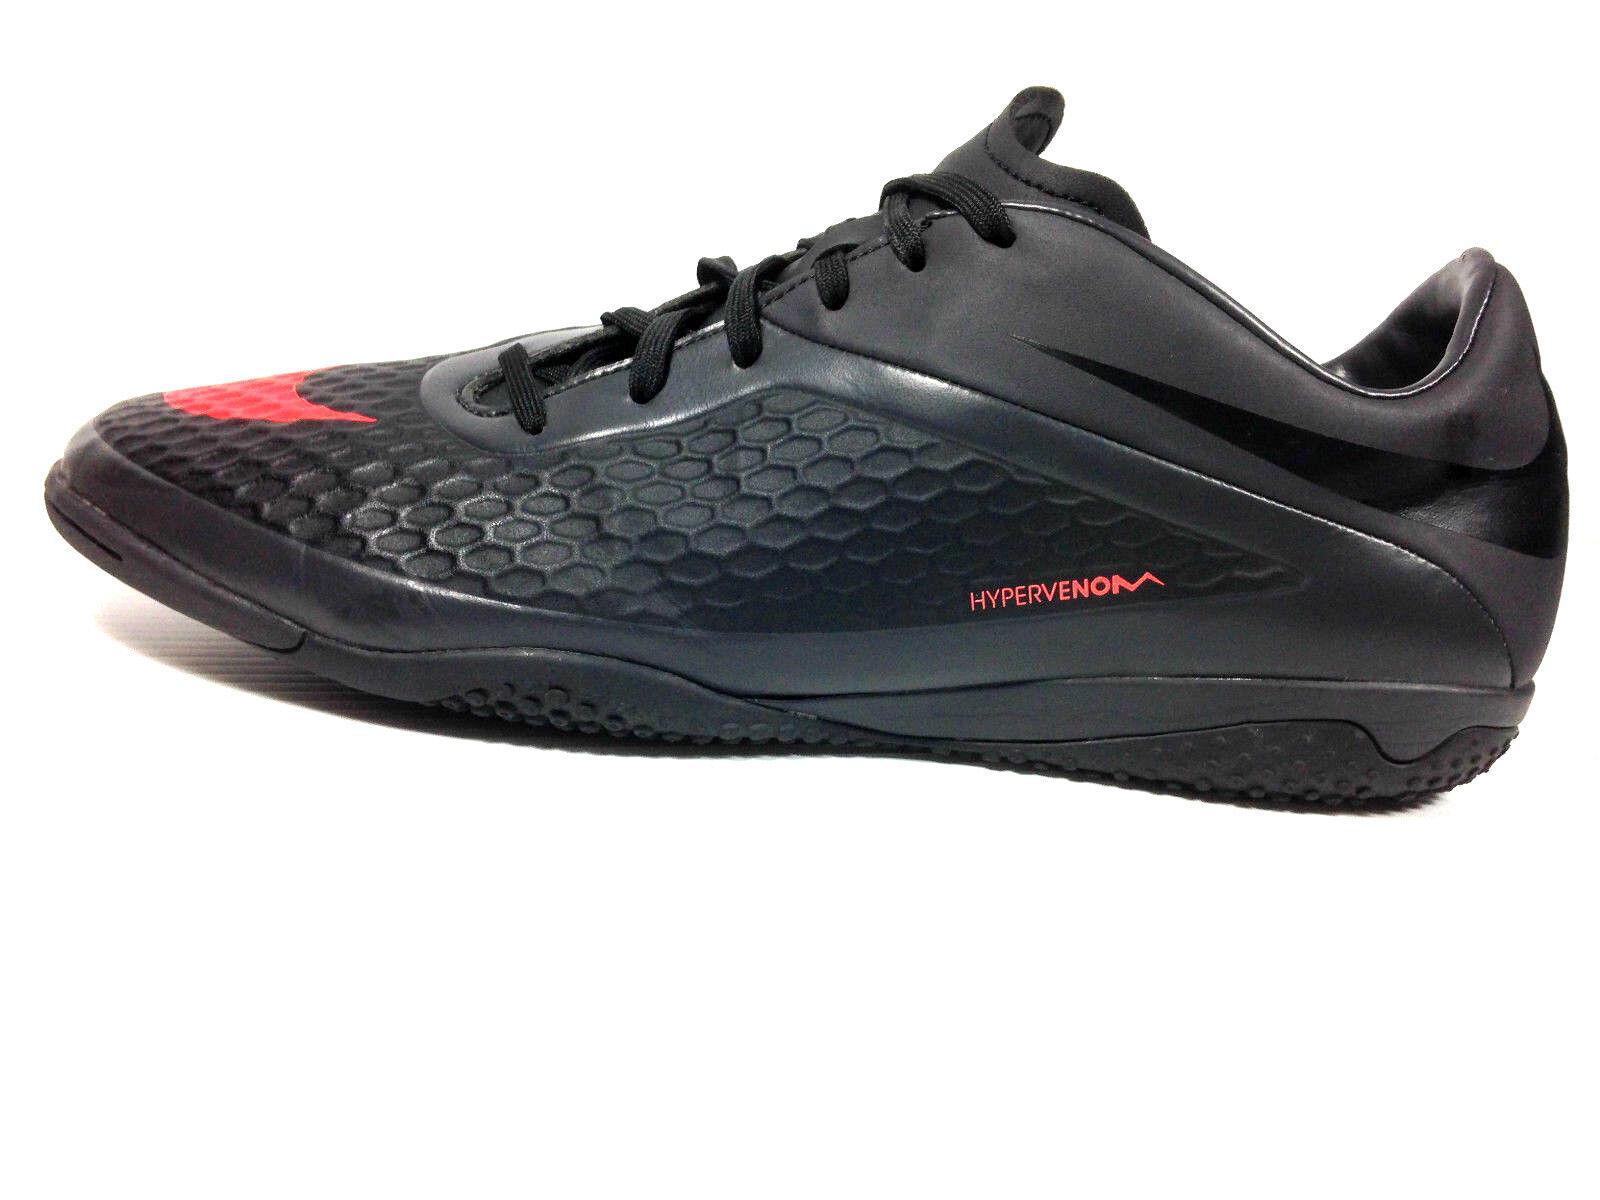 Nike hipervenom Men's Black Sneakers Size 12 US.